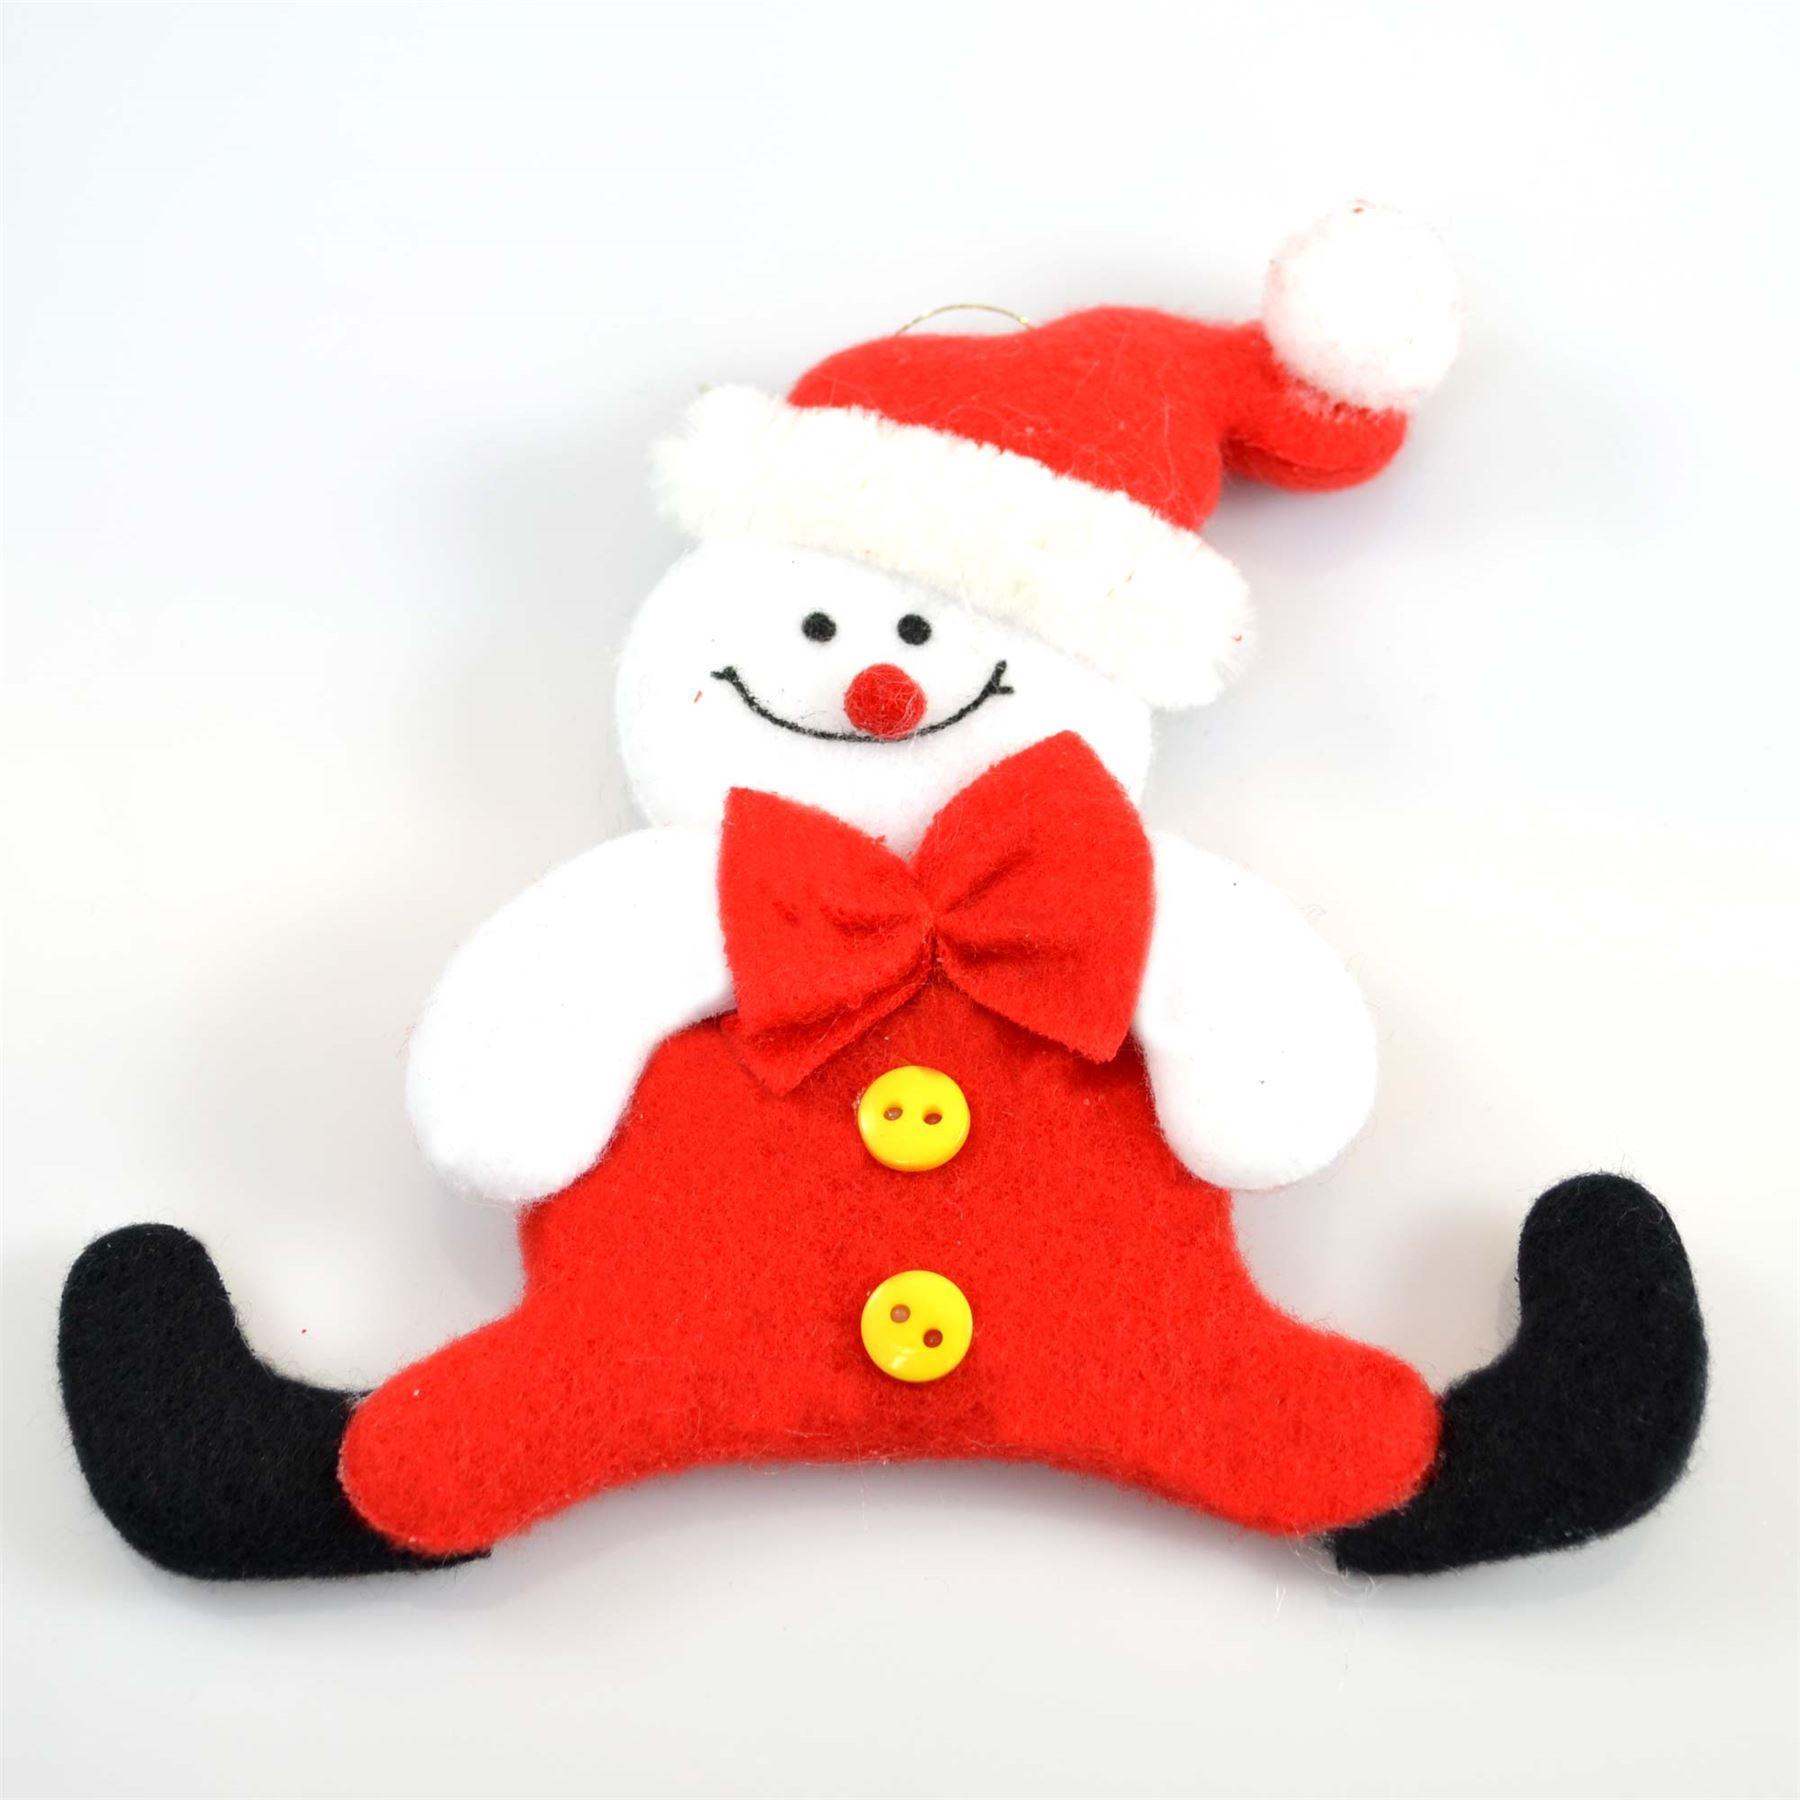 Christmas-Tree-Hanging-Decorations-Glitter-Snowman-Xmas-Beads-Chain-Garland thumbnail 25